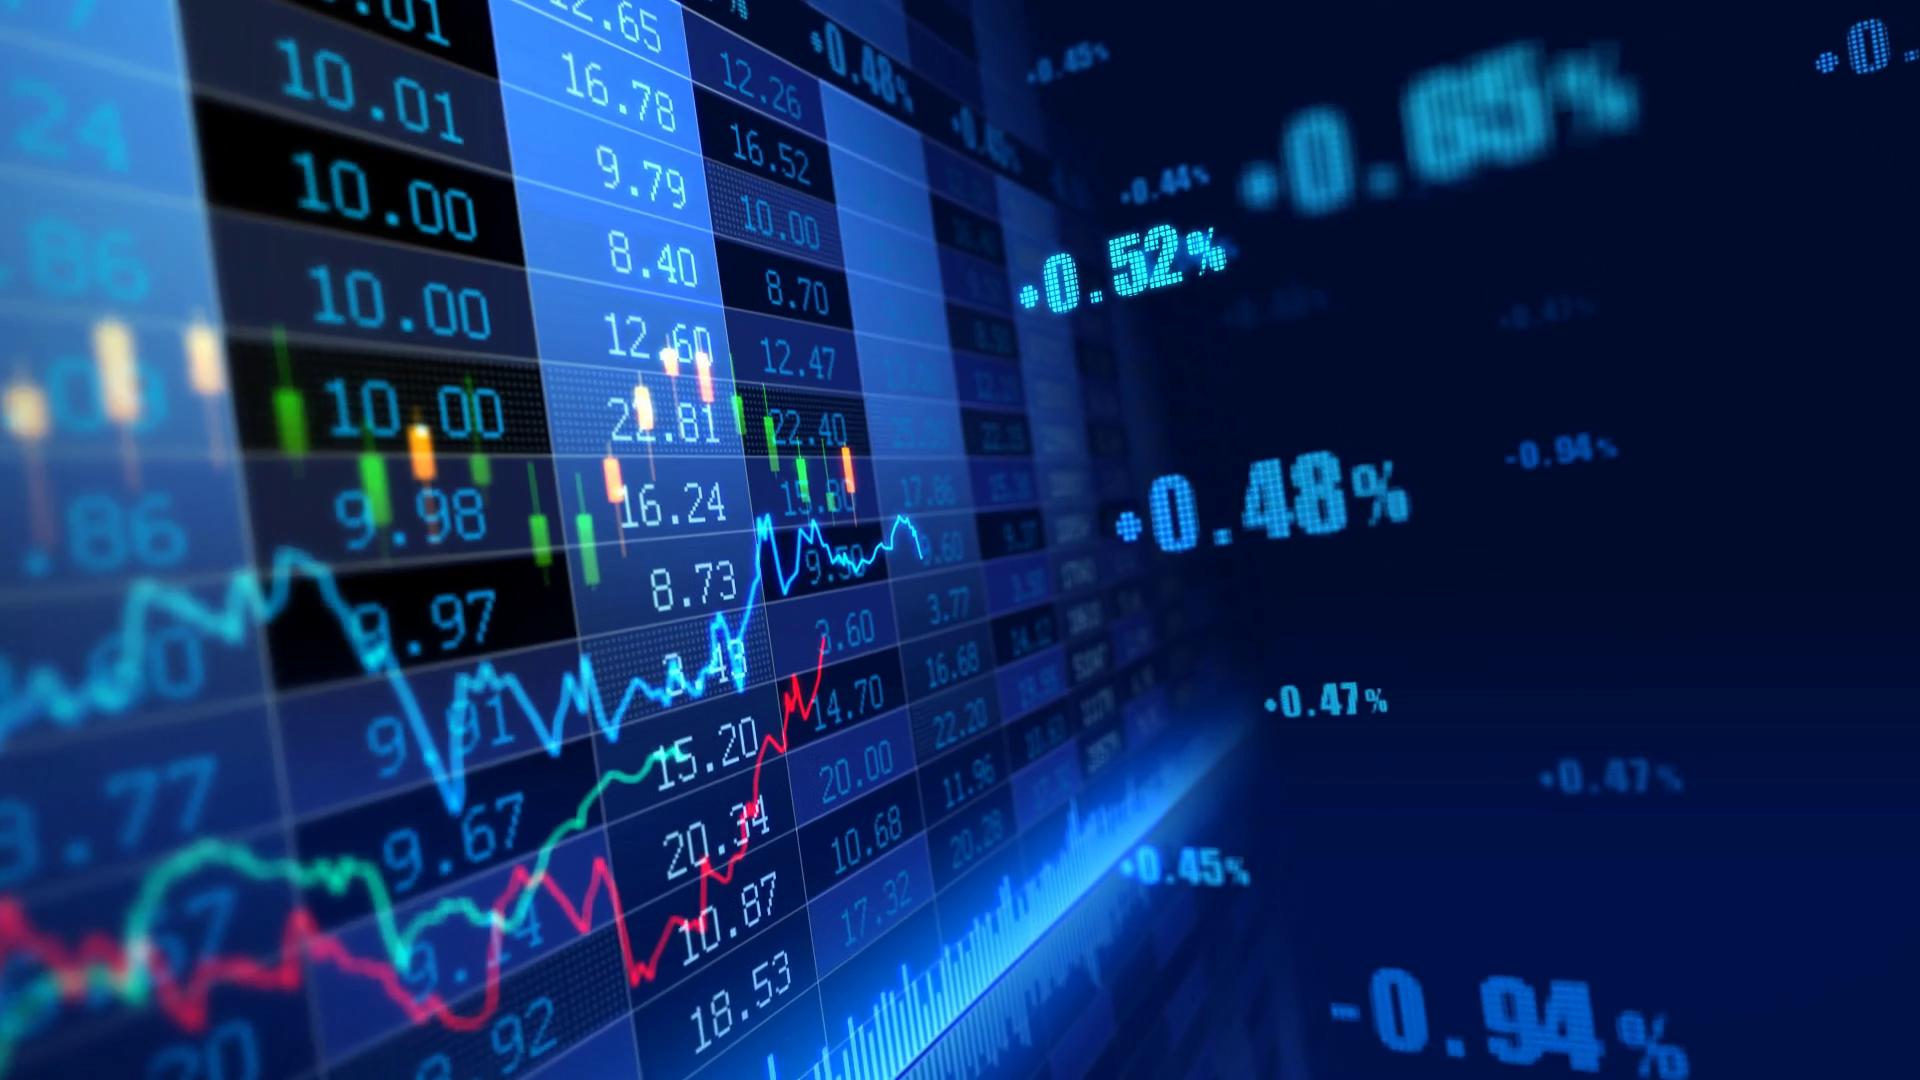 Stock Market Wallpaper Hd - 1920x1080 - Download HD ...